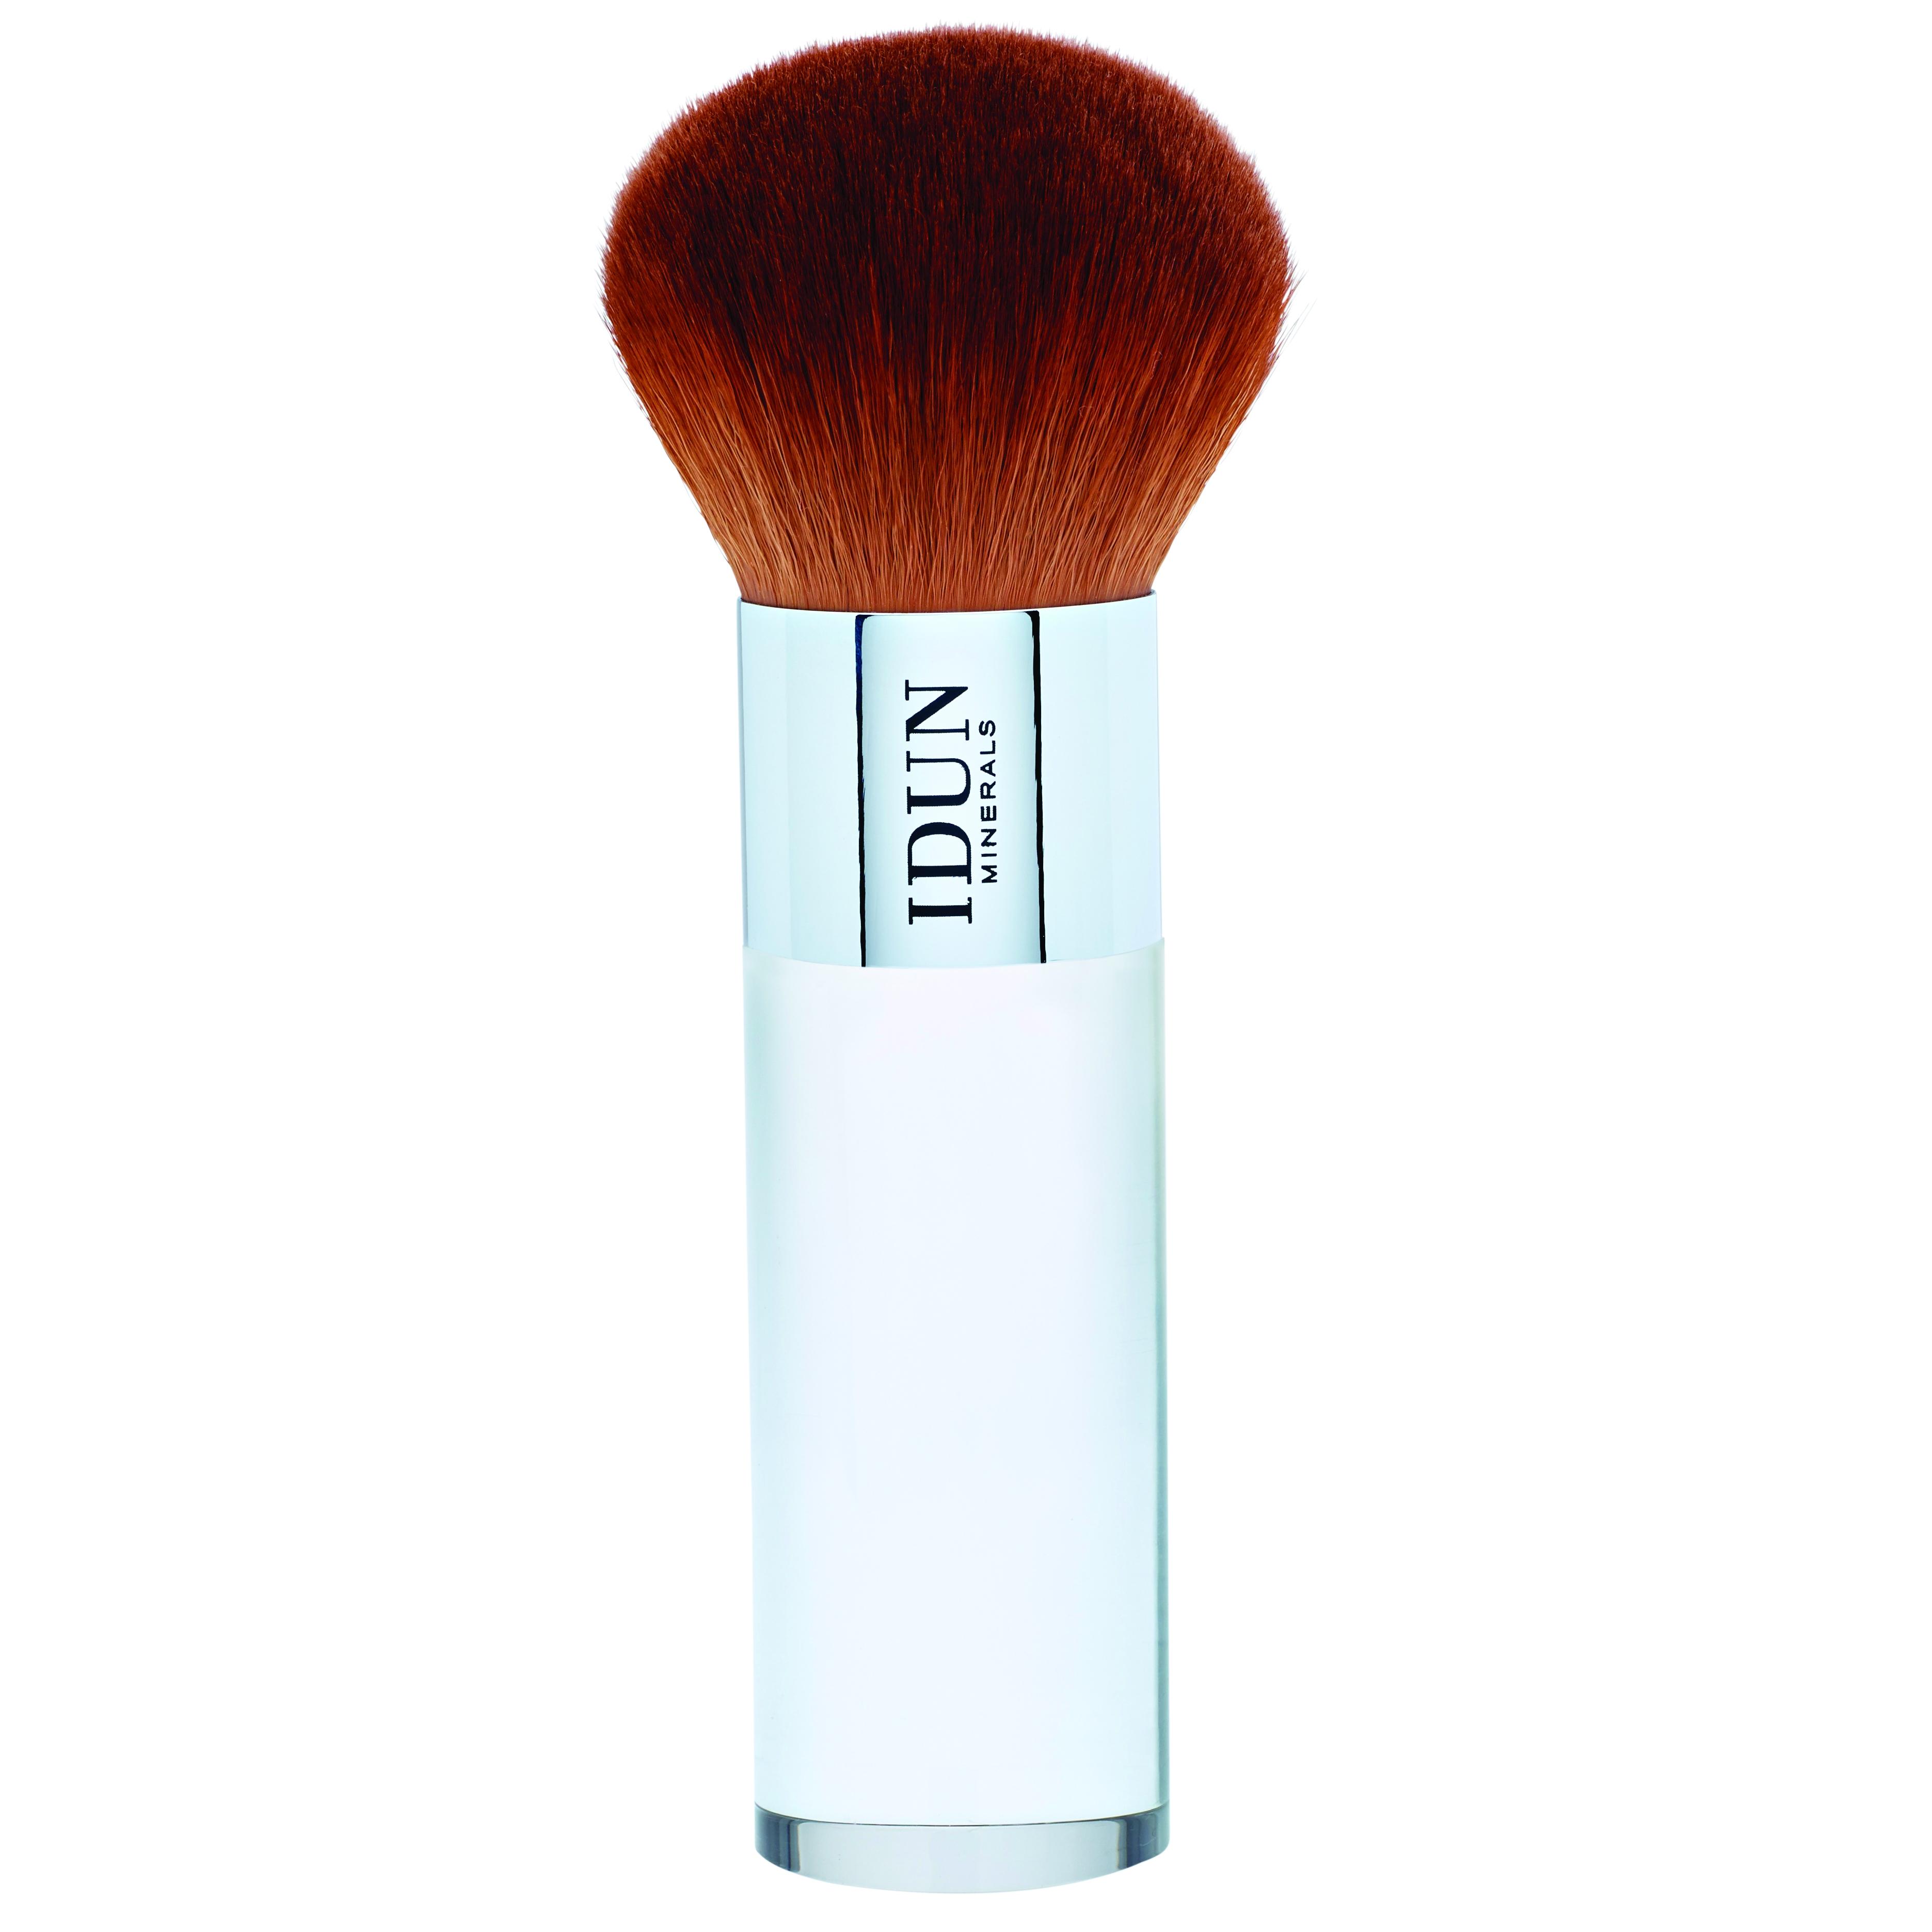 Image of IDUN Minerals Large powder brush (1 stk)